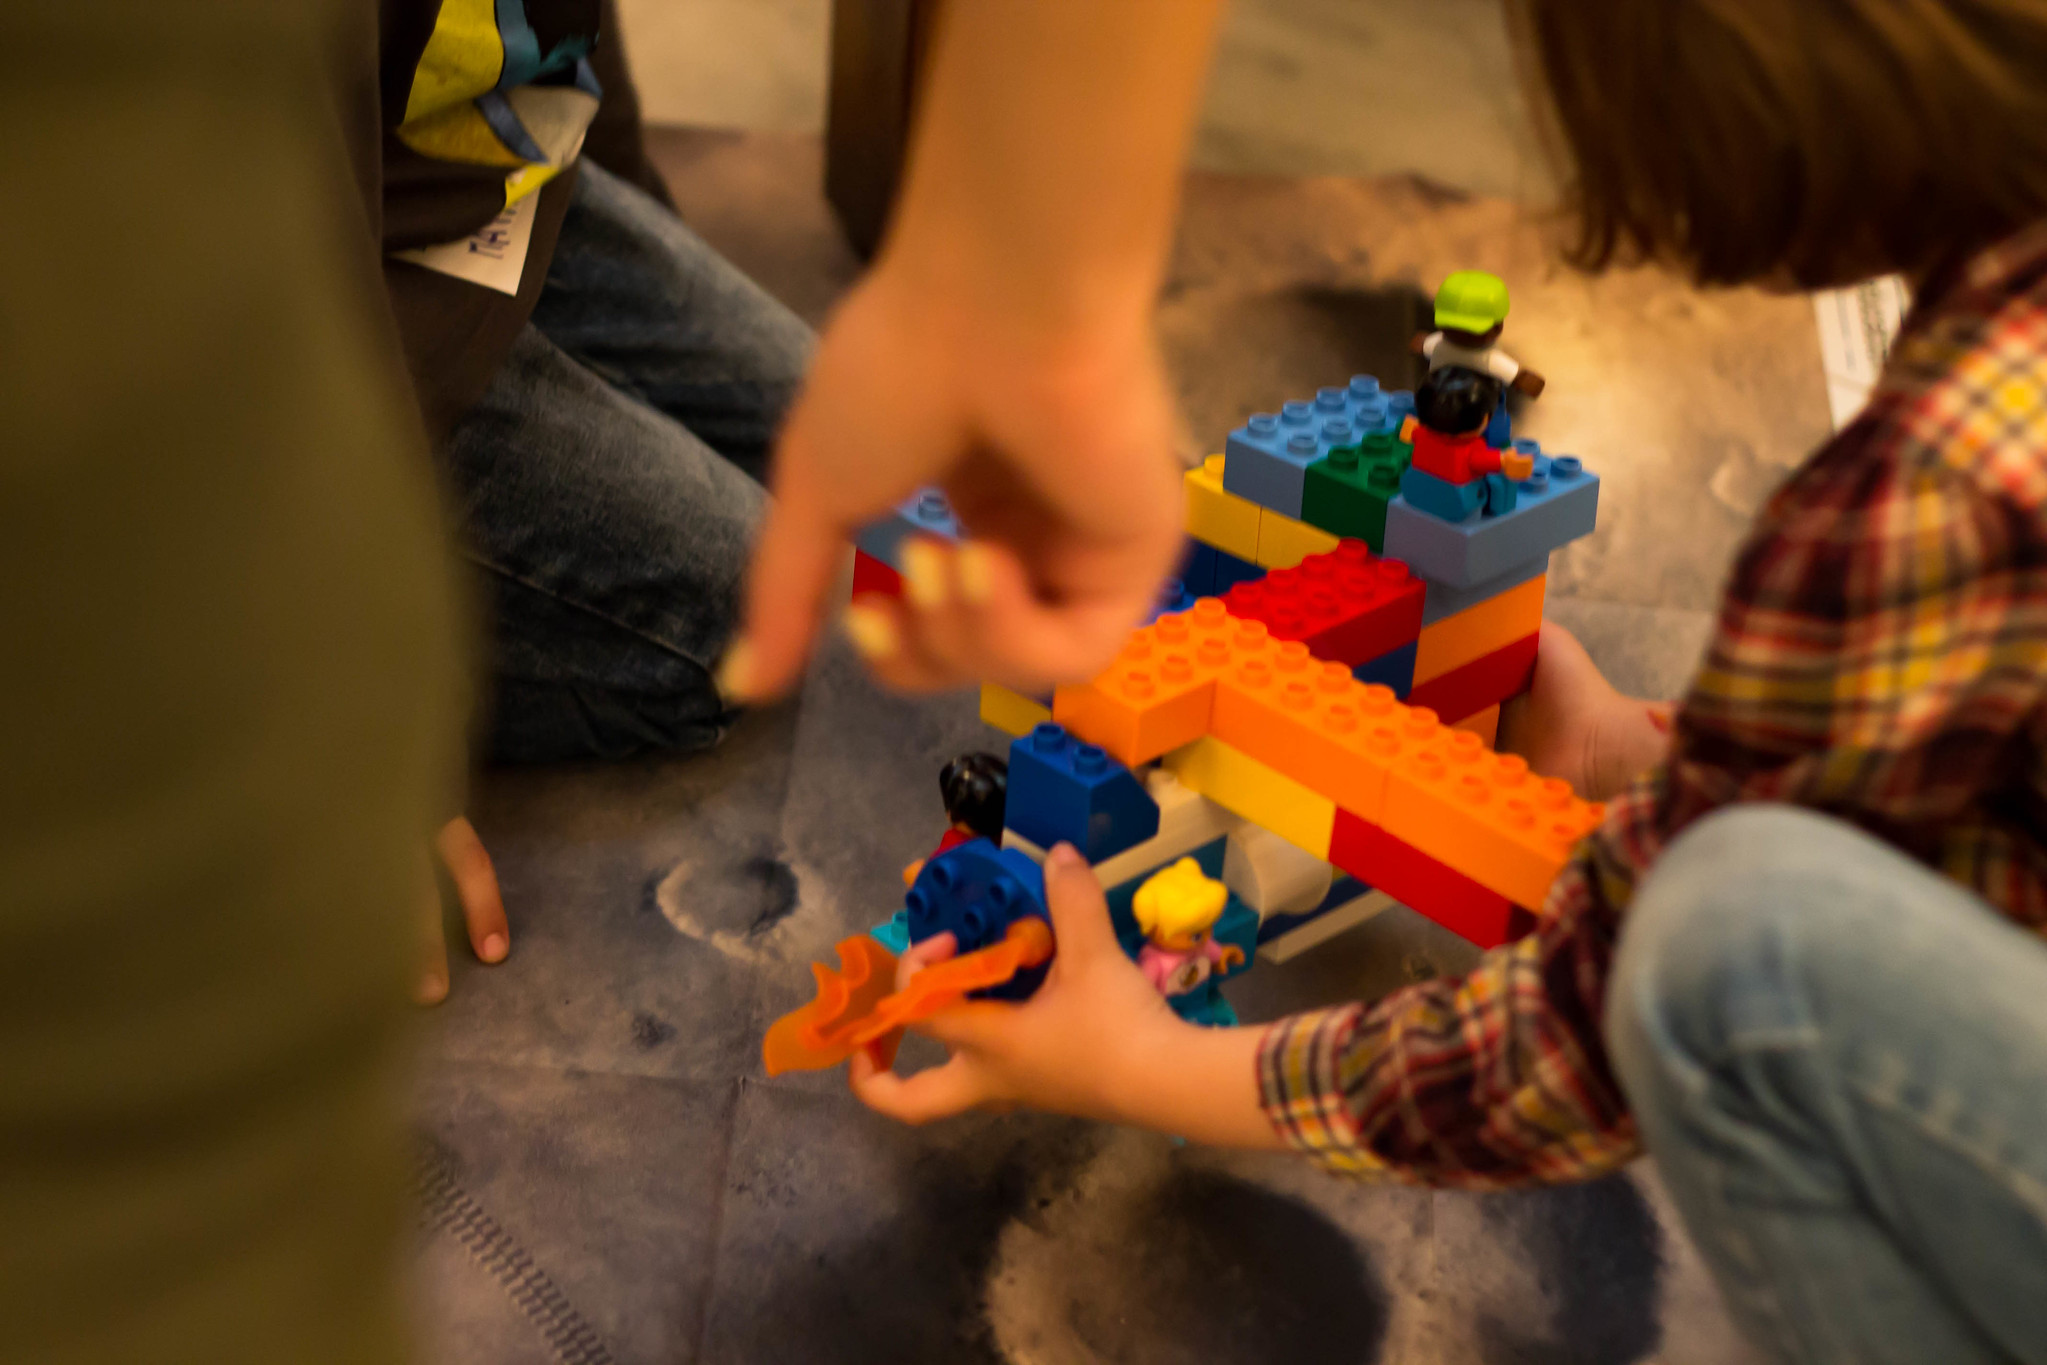 FLL JR Discovery για ομάδες ηλικίας 4-6 ετών